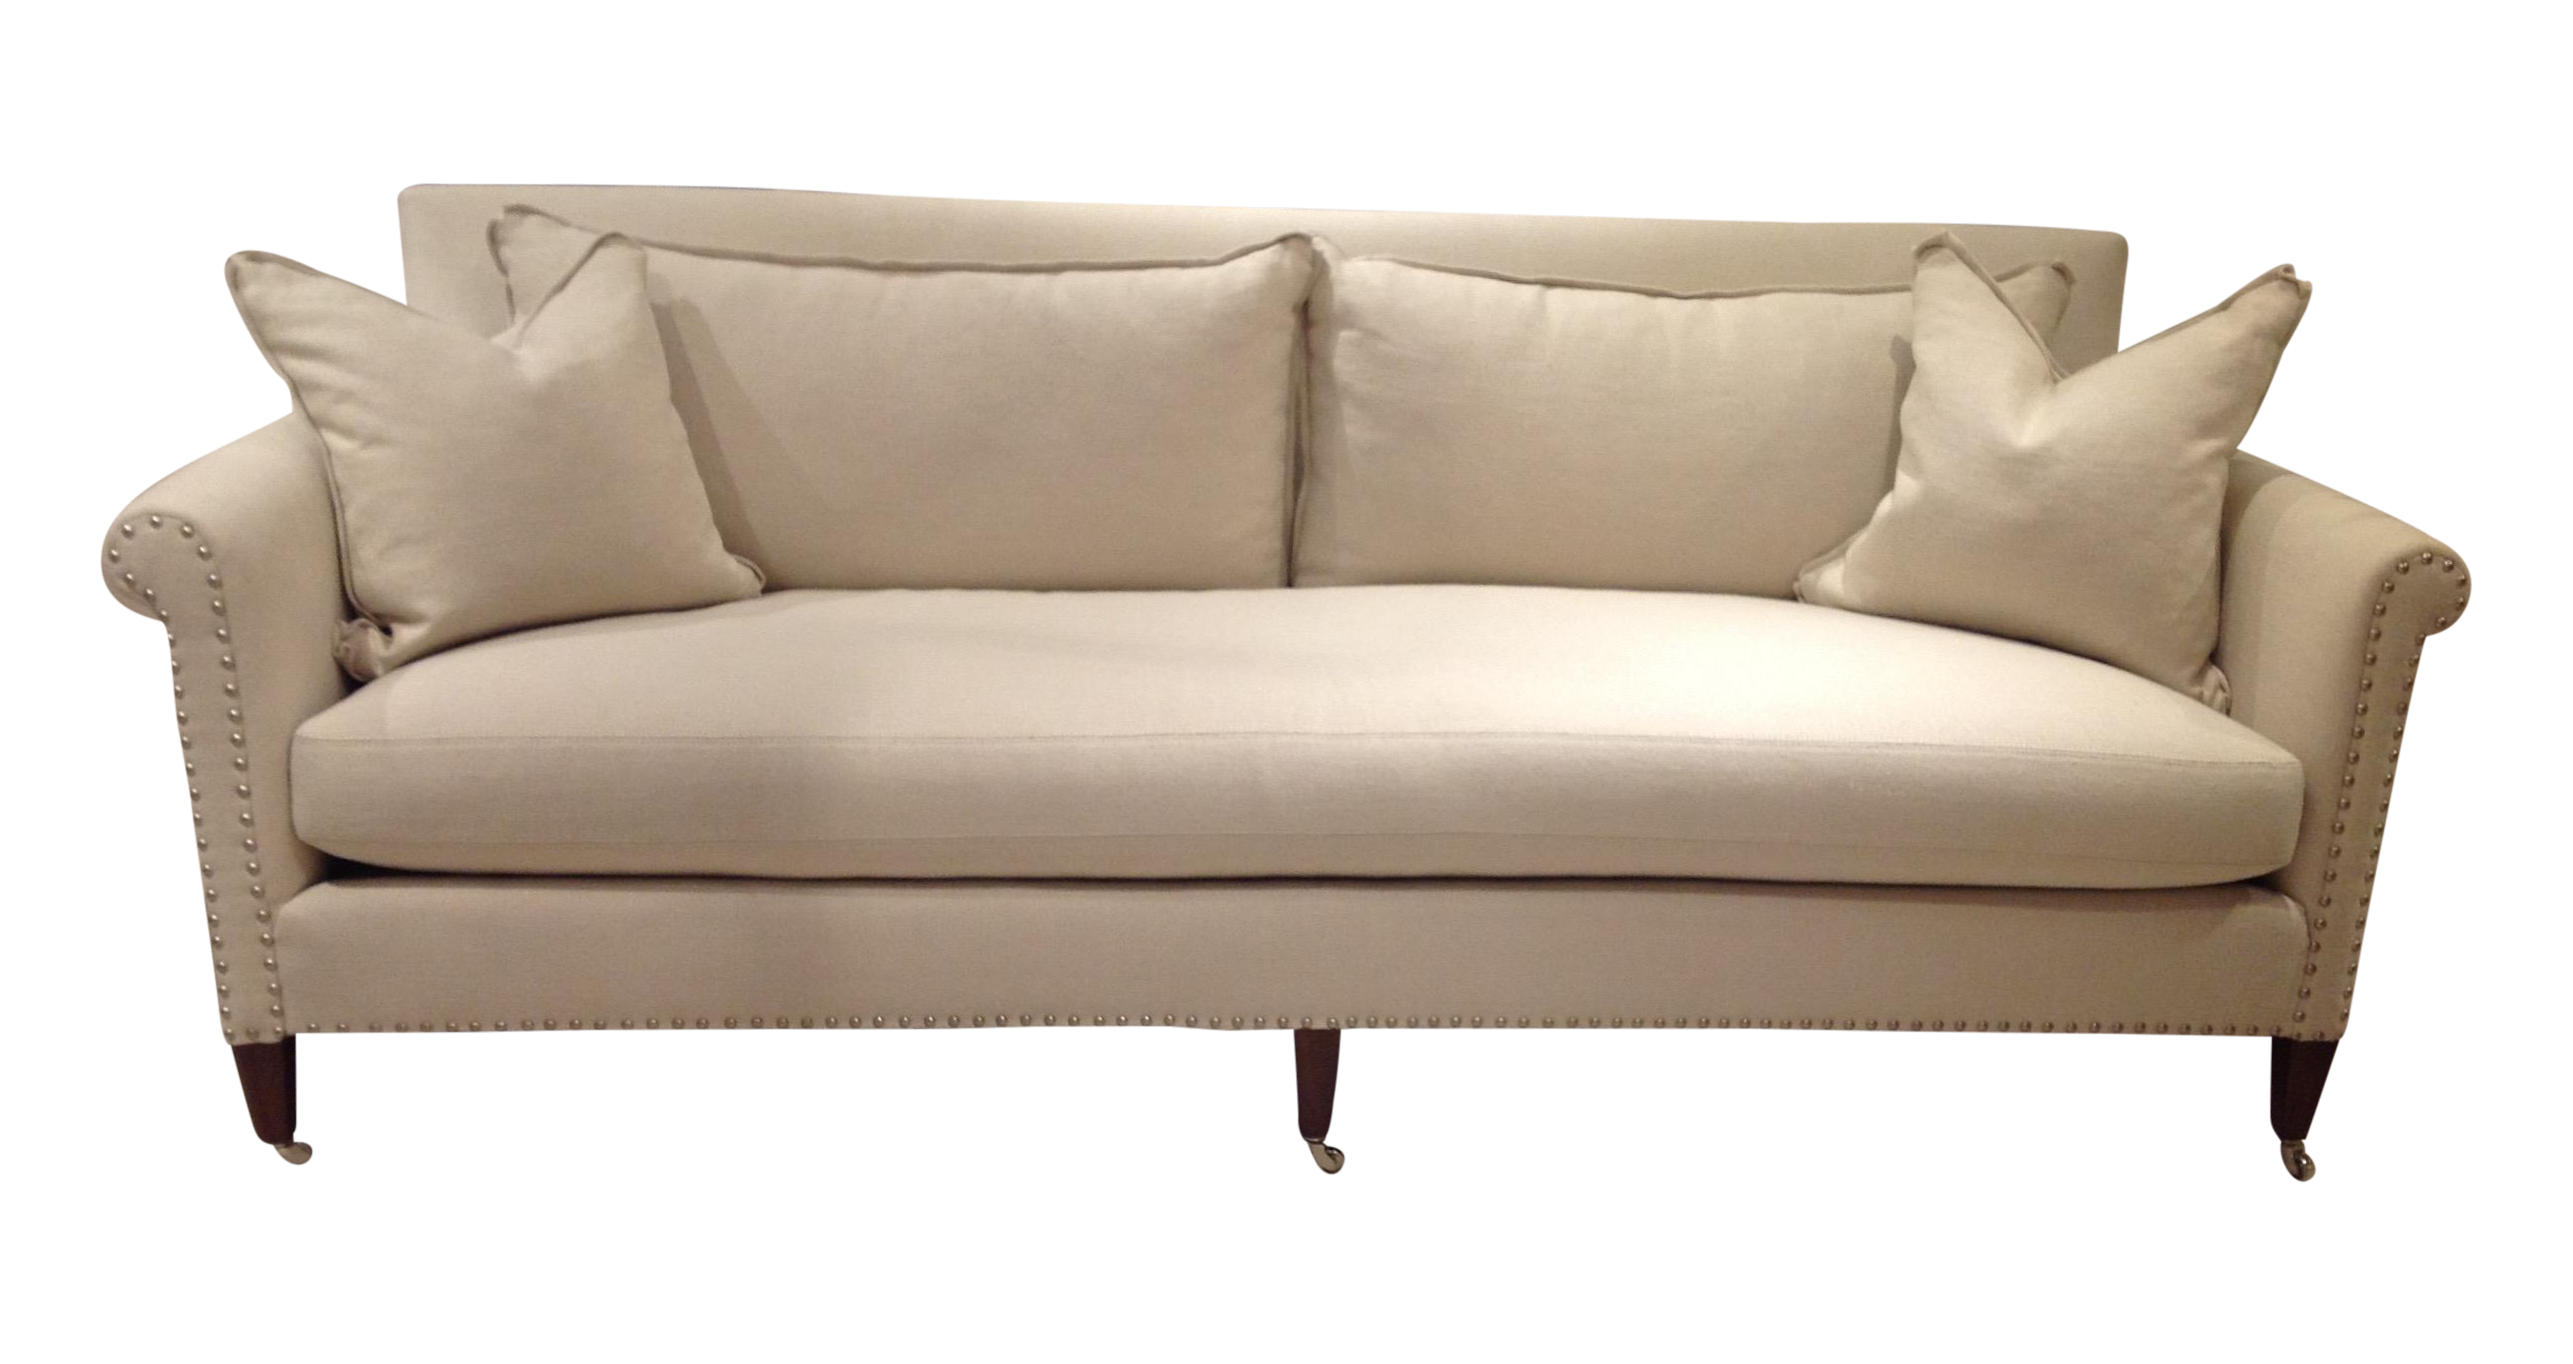 Lillian August Paris Linen Sofa On Chairish Com 87 0ʺw 39 0ʺd